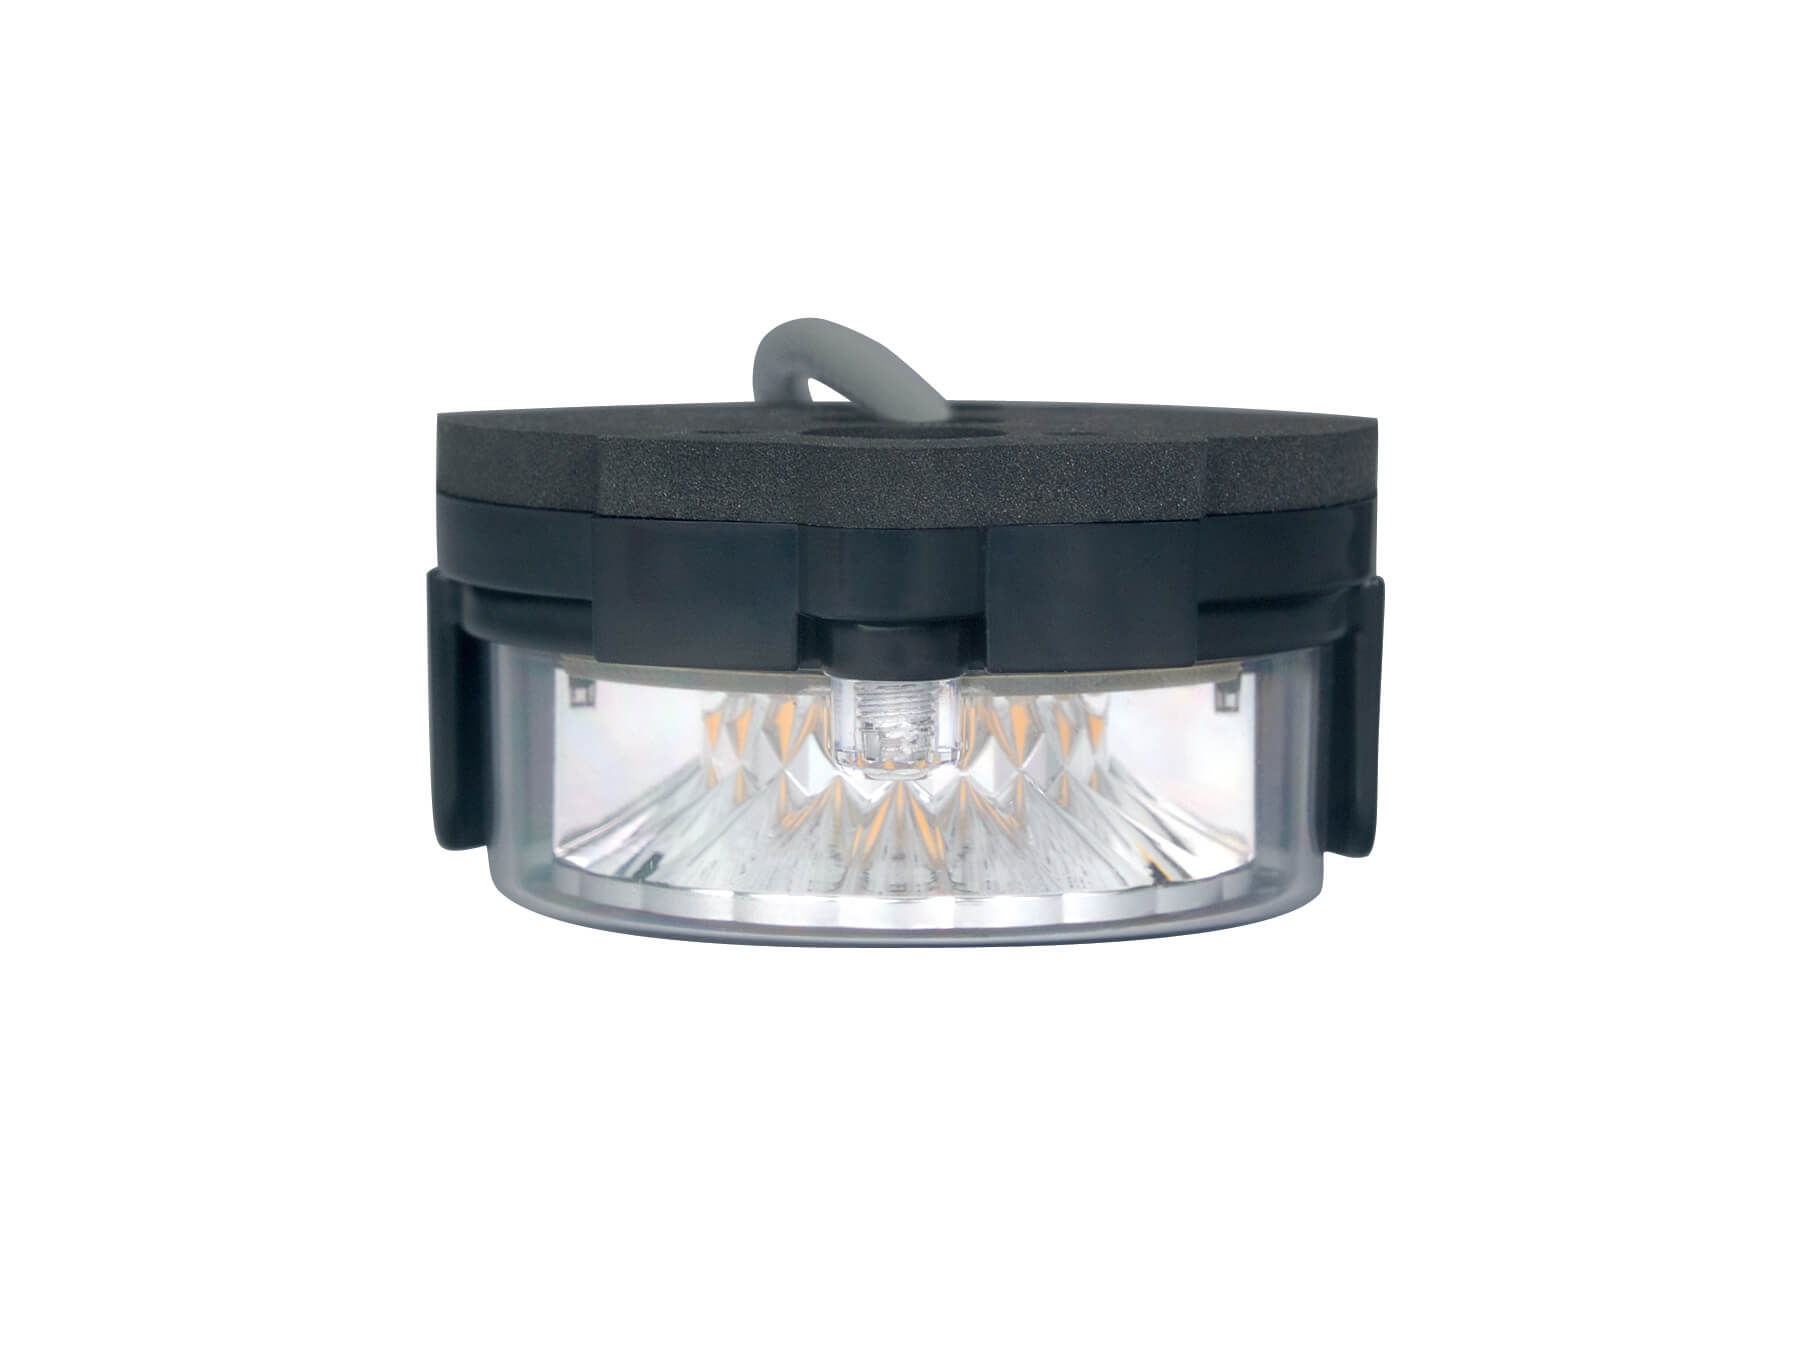 SoundOff Signal Intersector LED Under Mirror Light - StrobesNMore.com